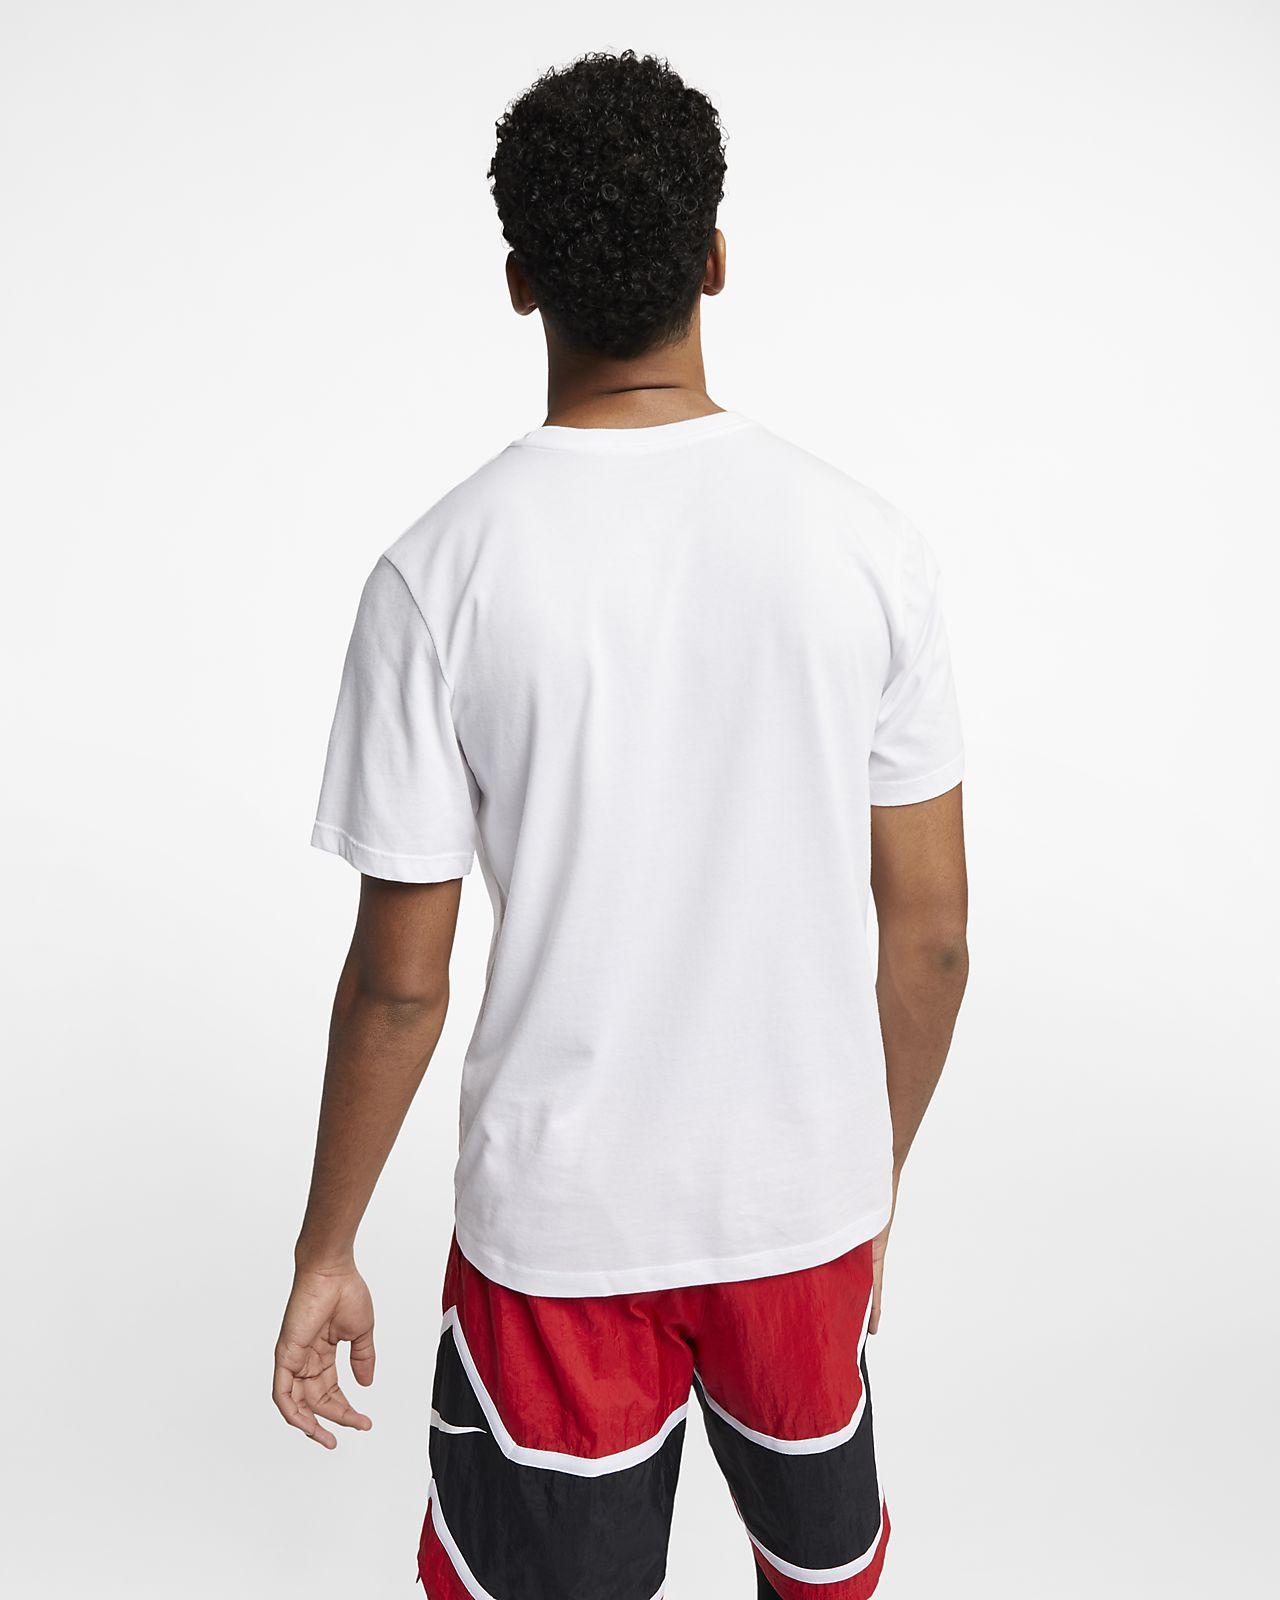 cc821cece17a Nike Dri-FIT Men s Basketball T-Shirt. Nike.com IE